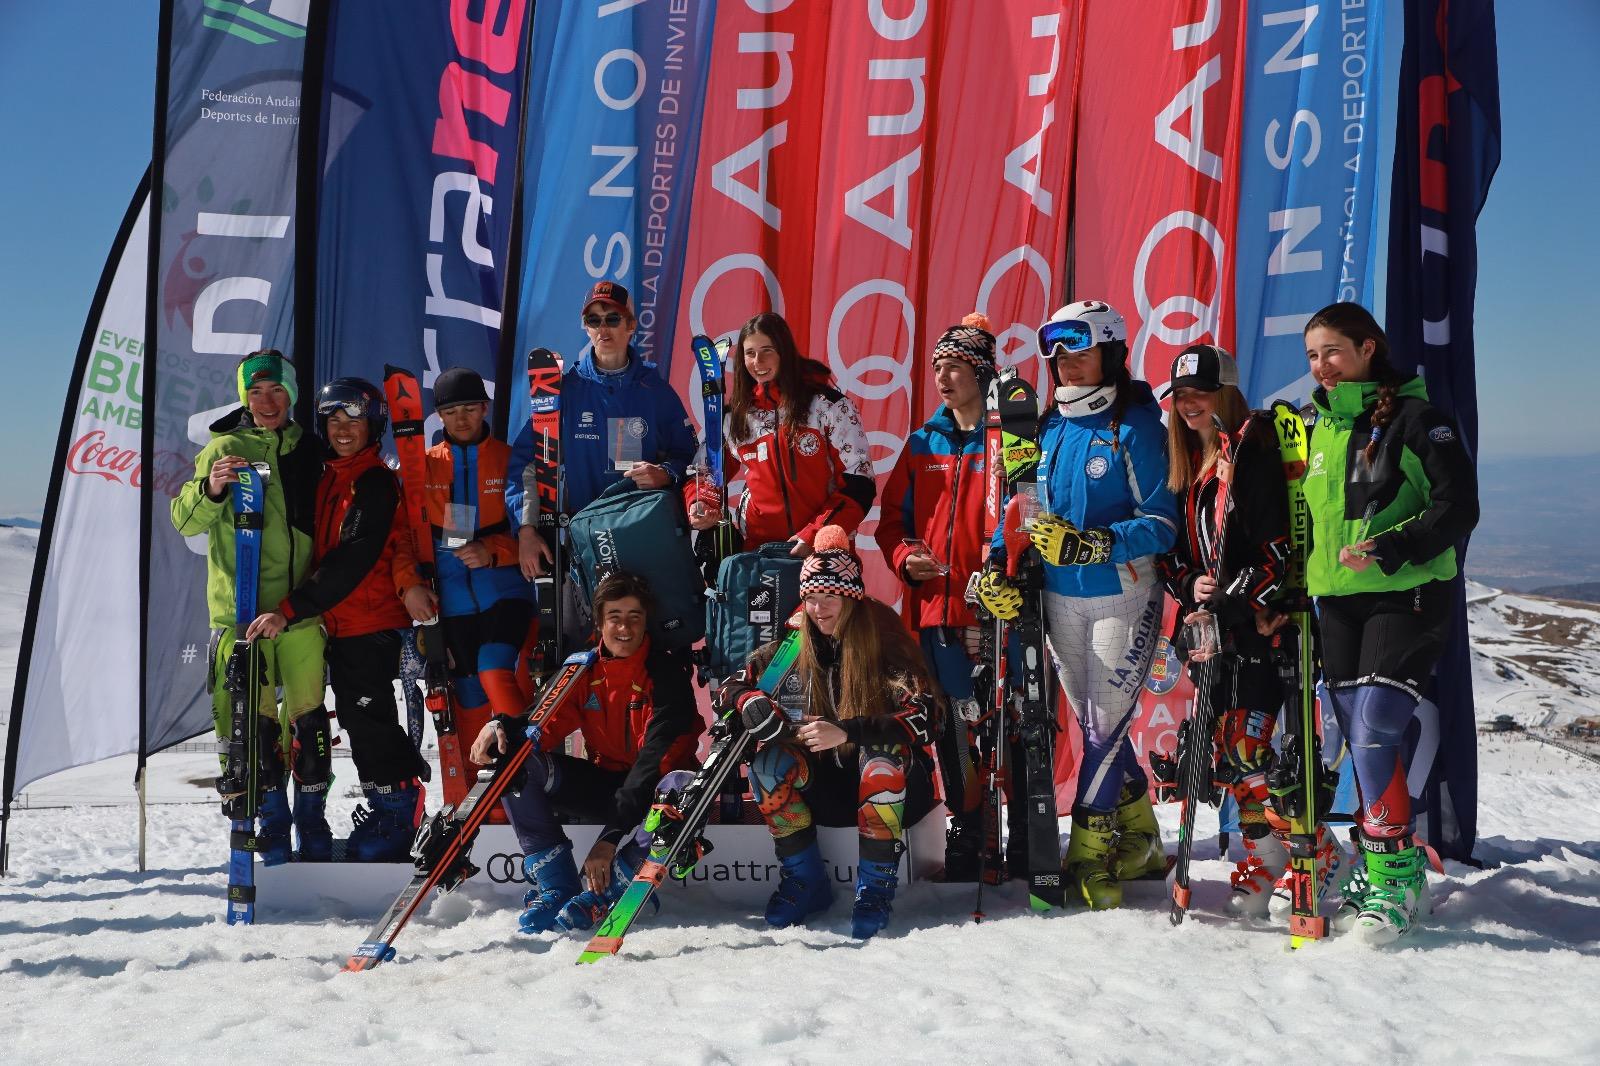 2 Fase Copa de España E. Alpino U14-U16 vuelve a Sierra nevada